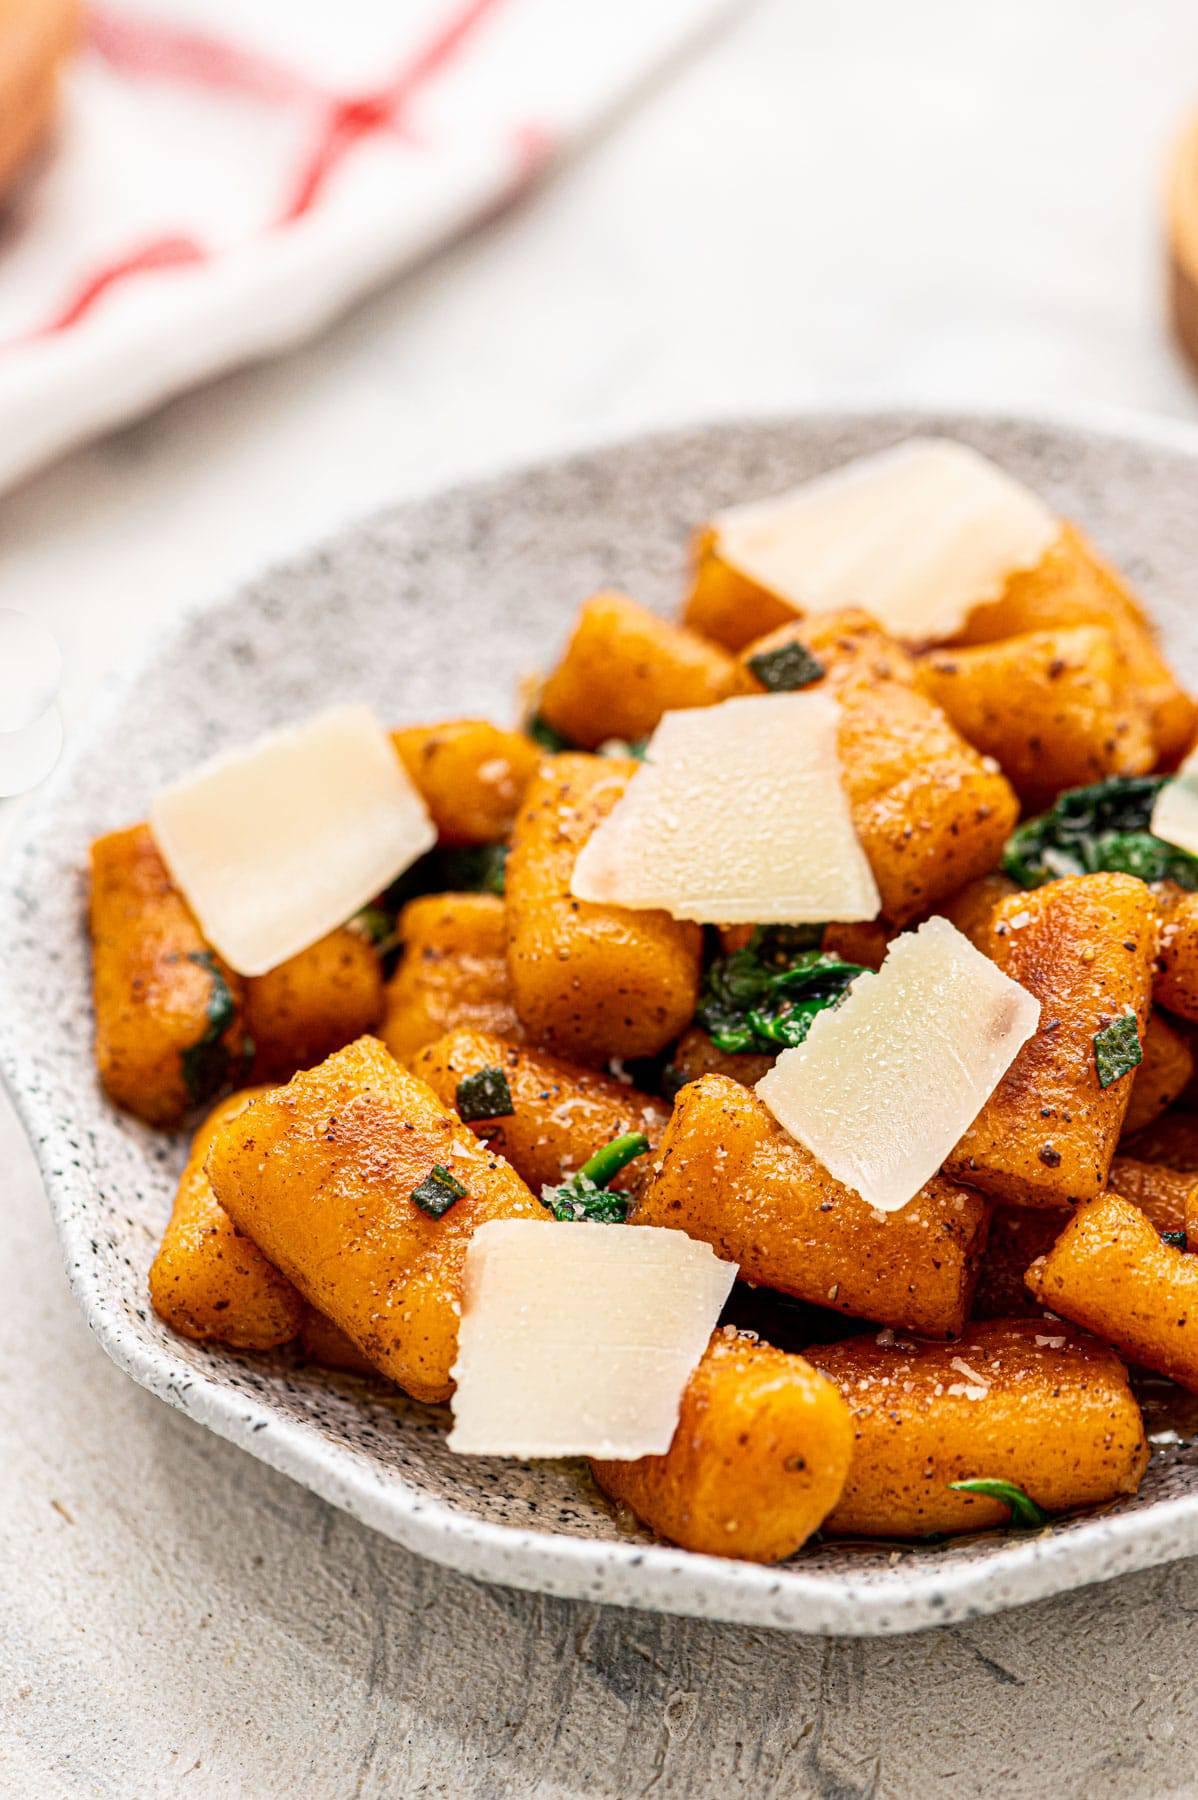 How to Make Sweet Potato Gnocchi